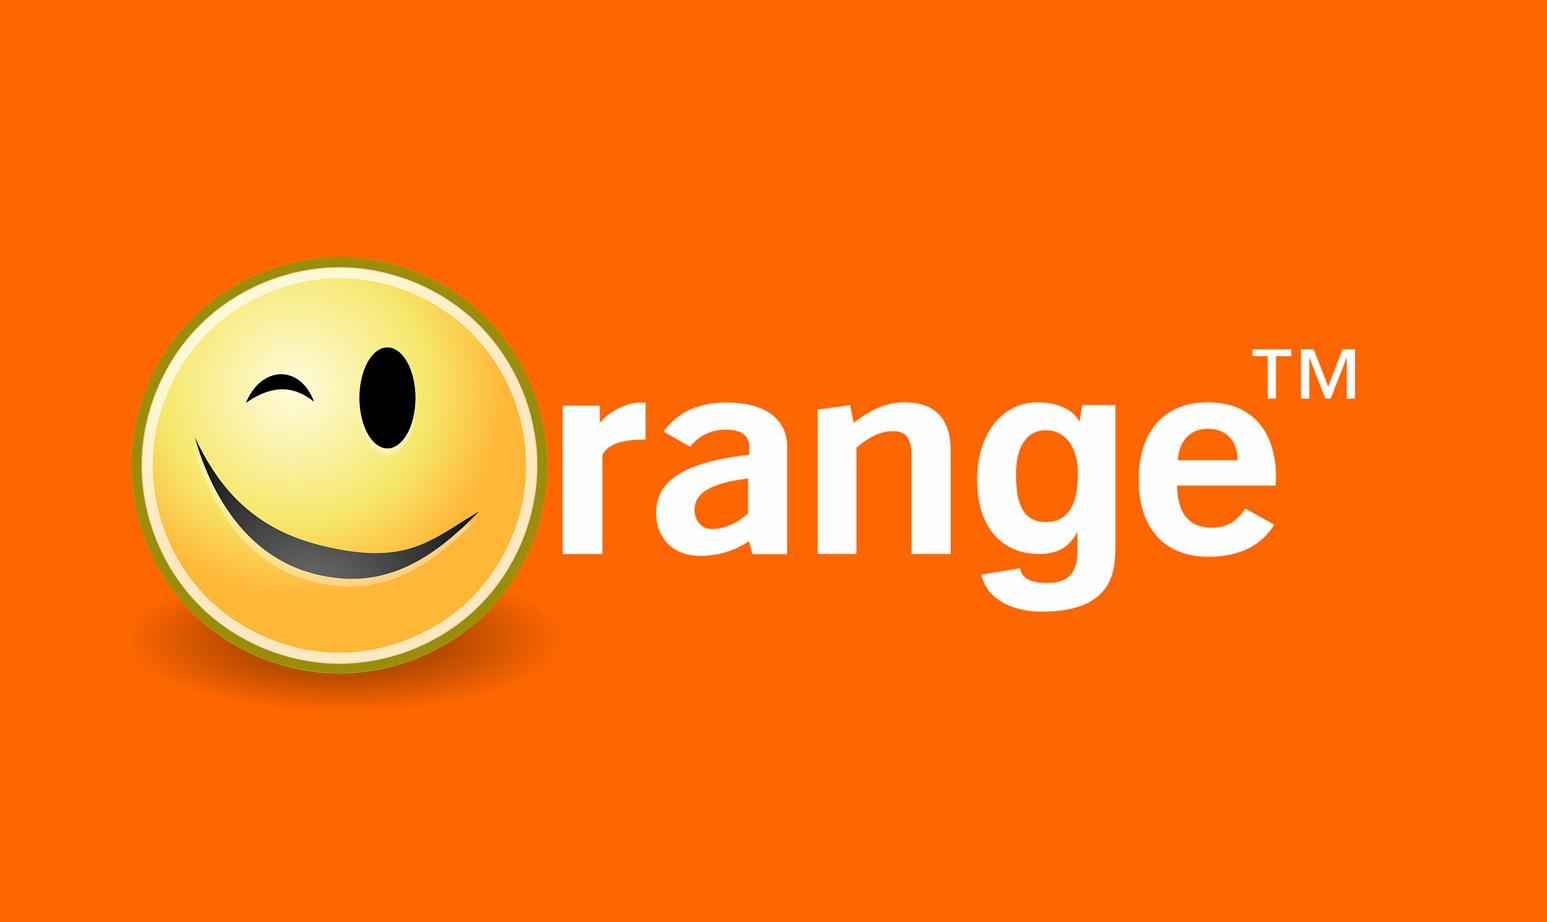 L'Arcep met en demeure l'opérateur mobile Orange